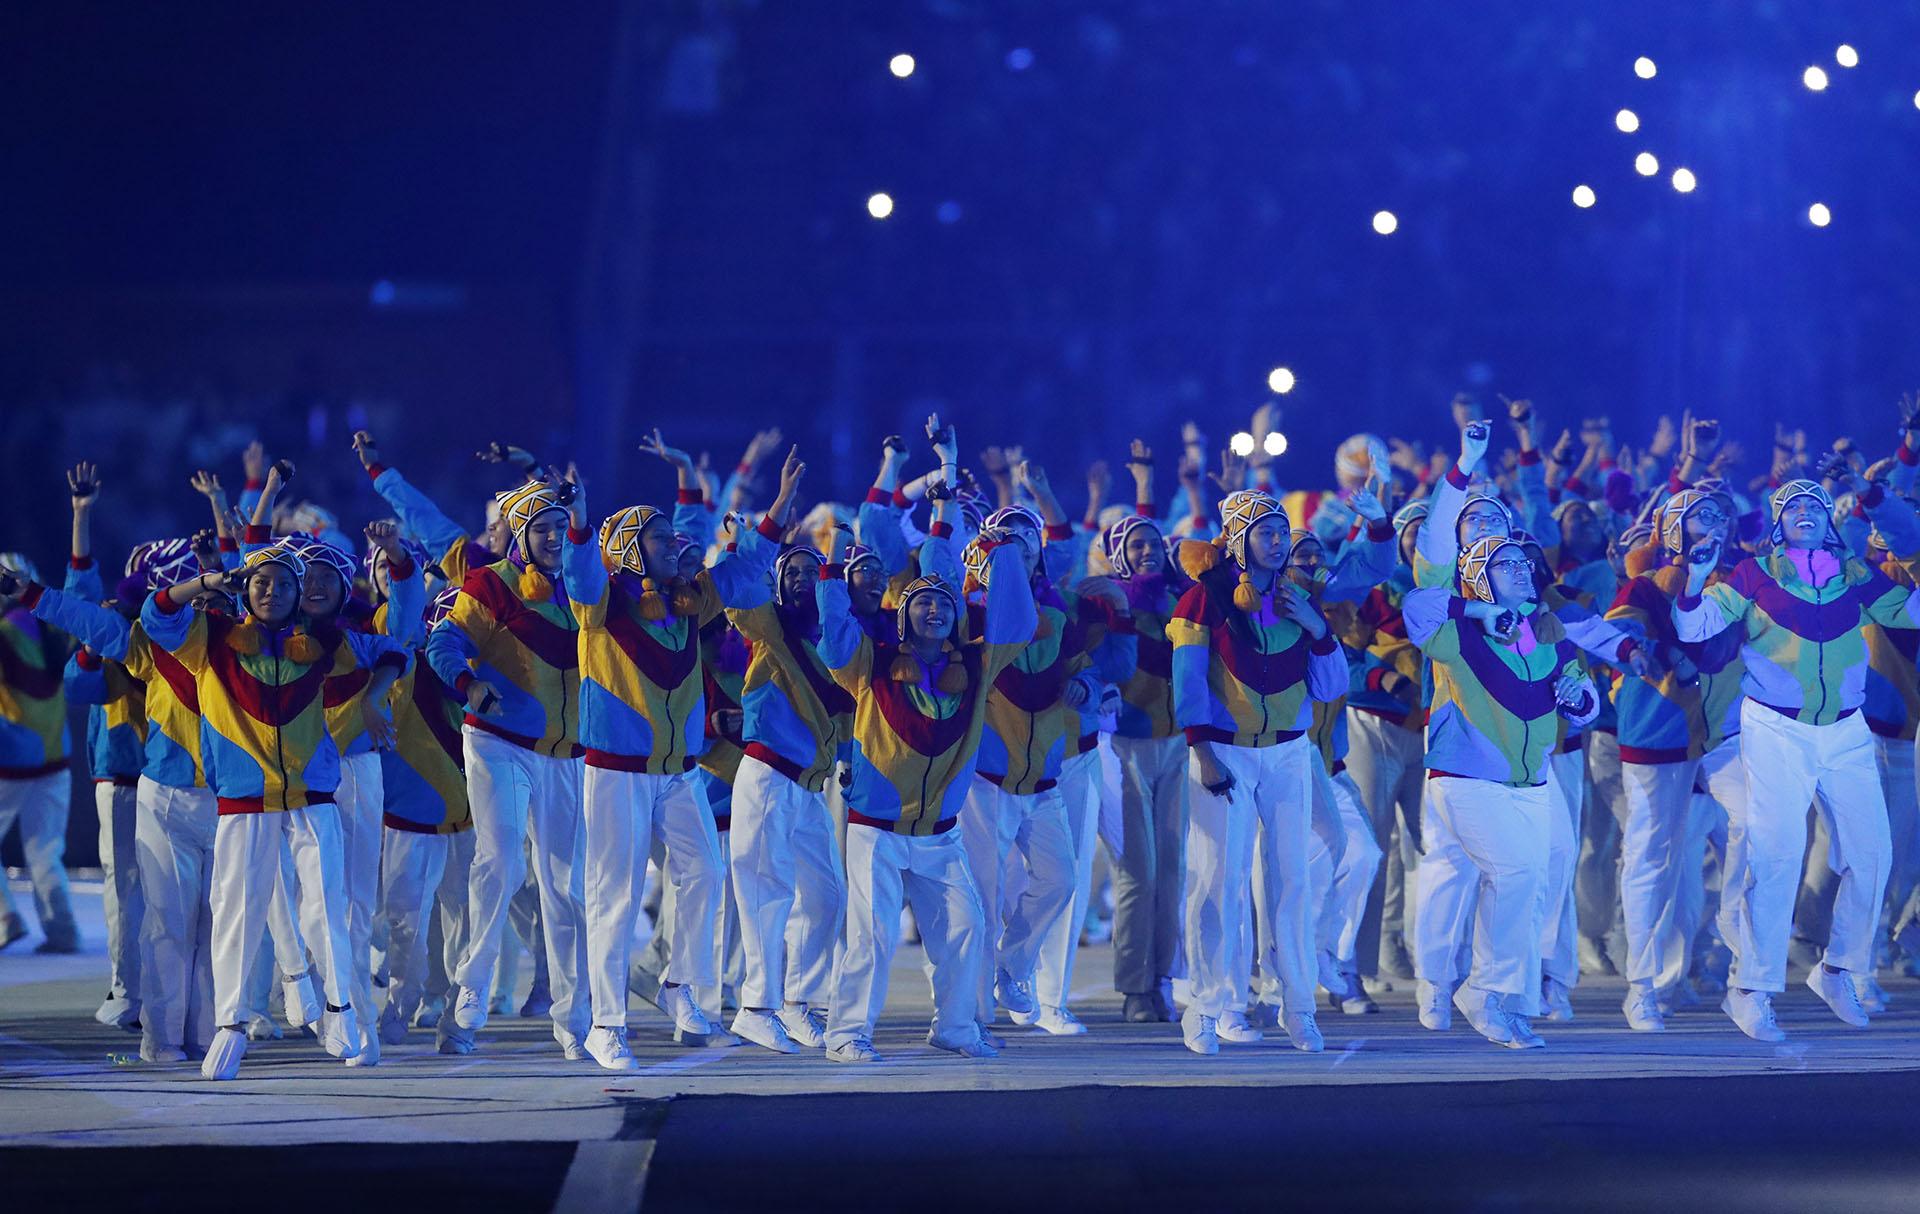 Protagonistas de la ceremonia en pleno baile (REUTERS/Henry Romero)